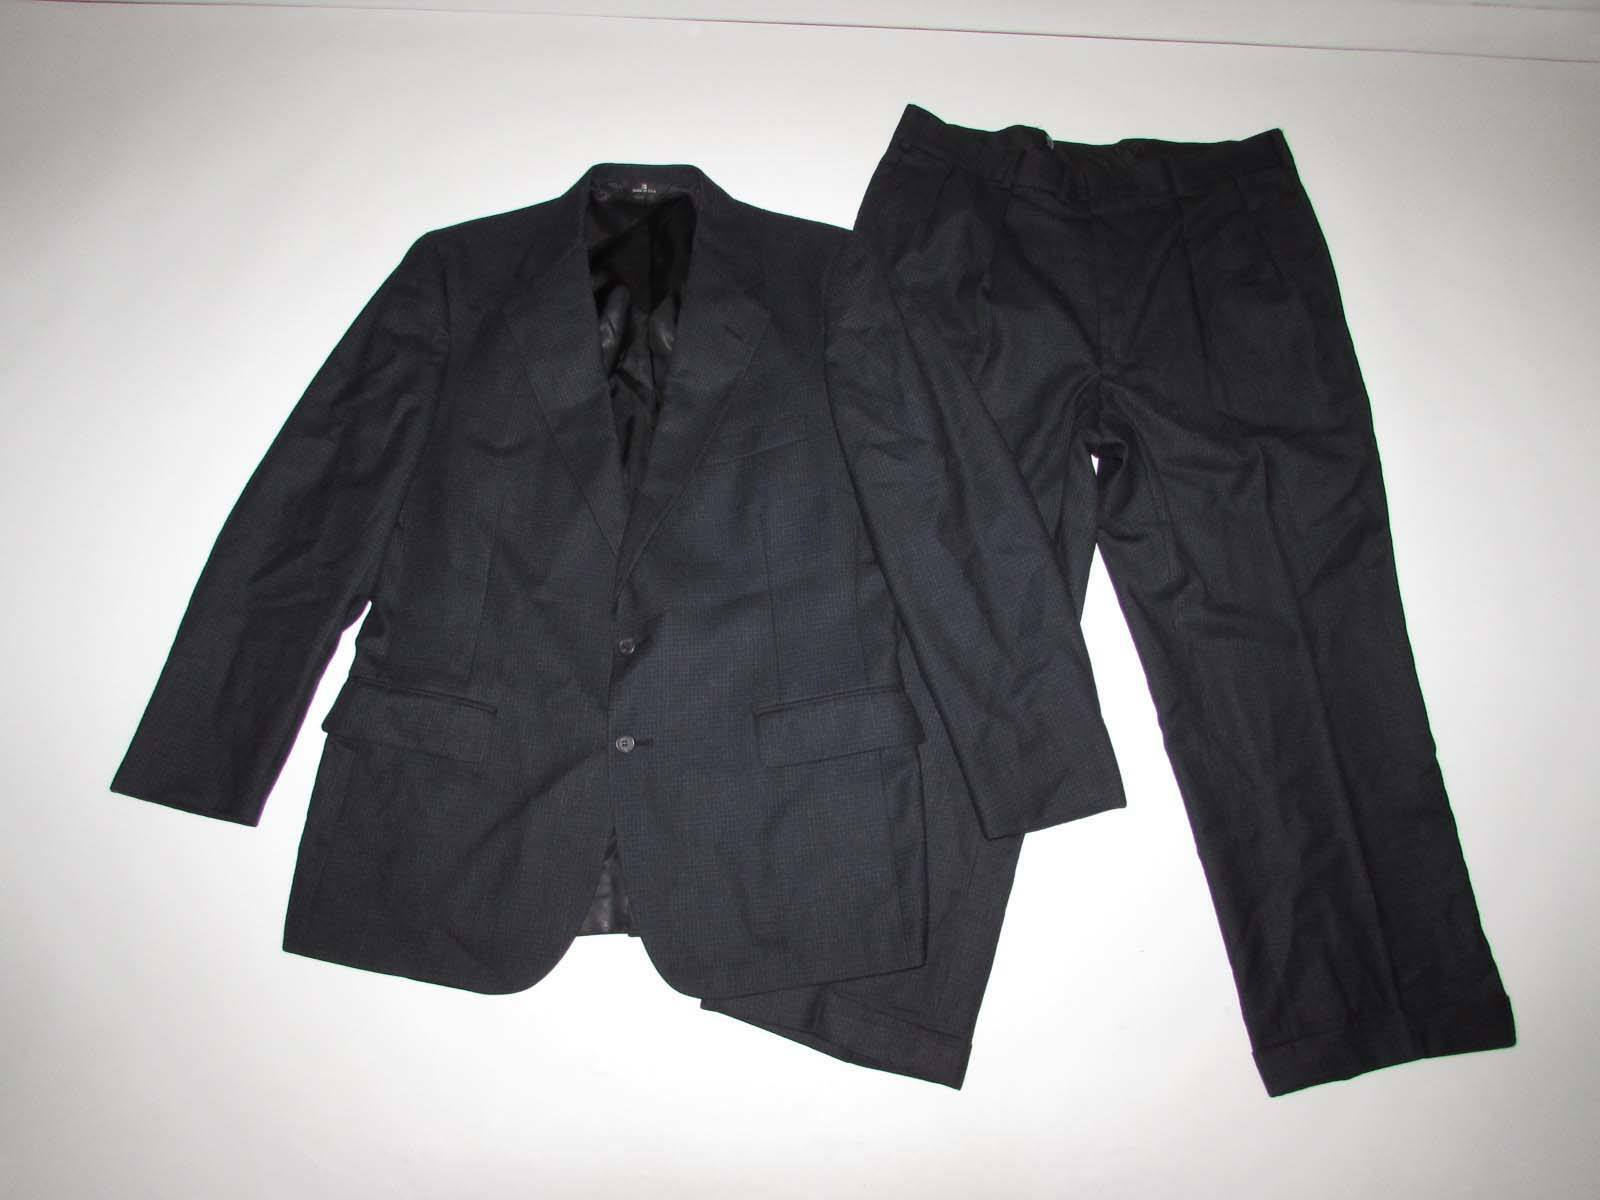 Polo Ralph Lauren Herren Anzug-Größe 40 Regulär 35 X 26.5 Dukles Marineblau Blau